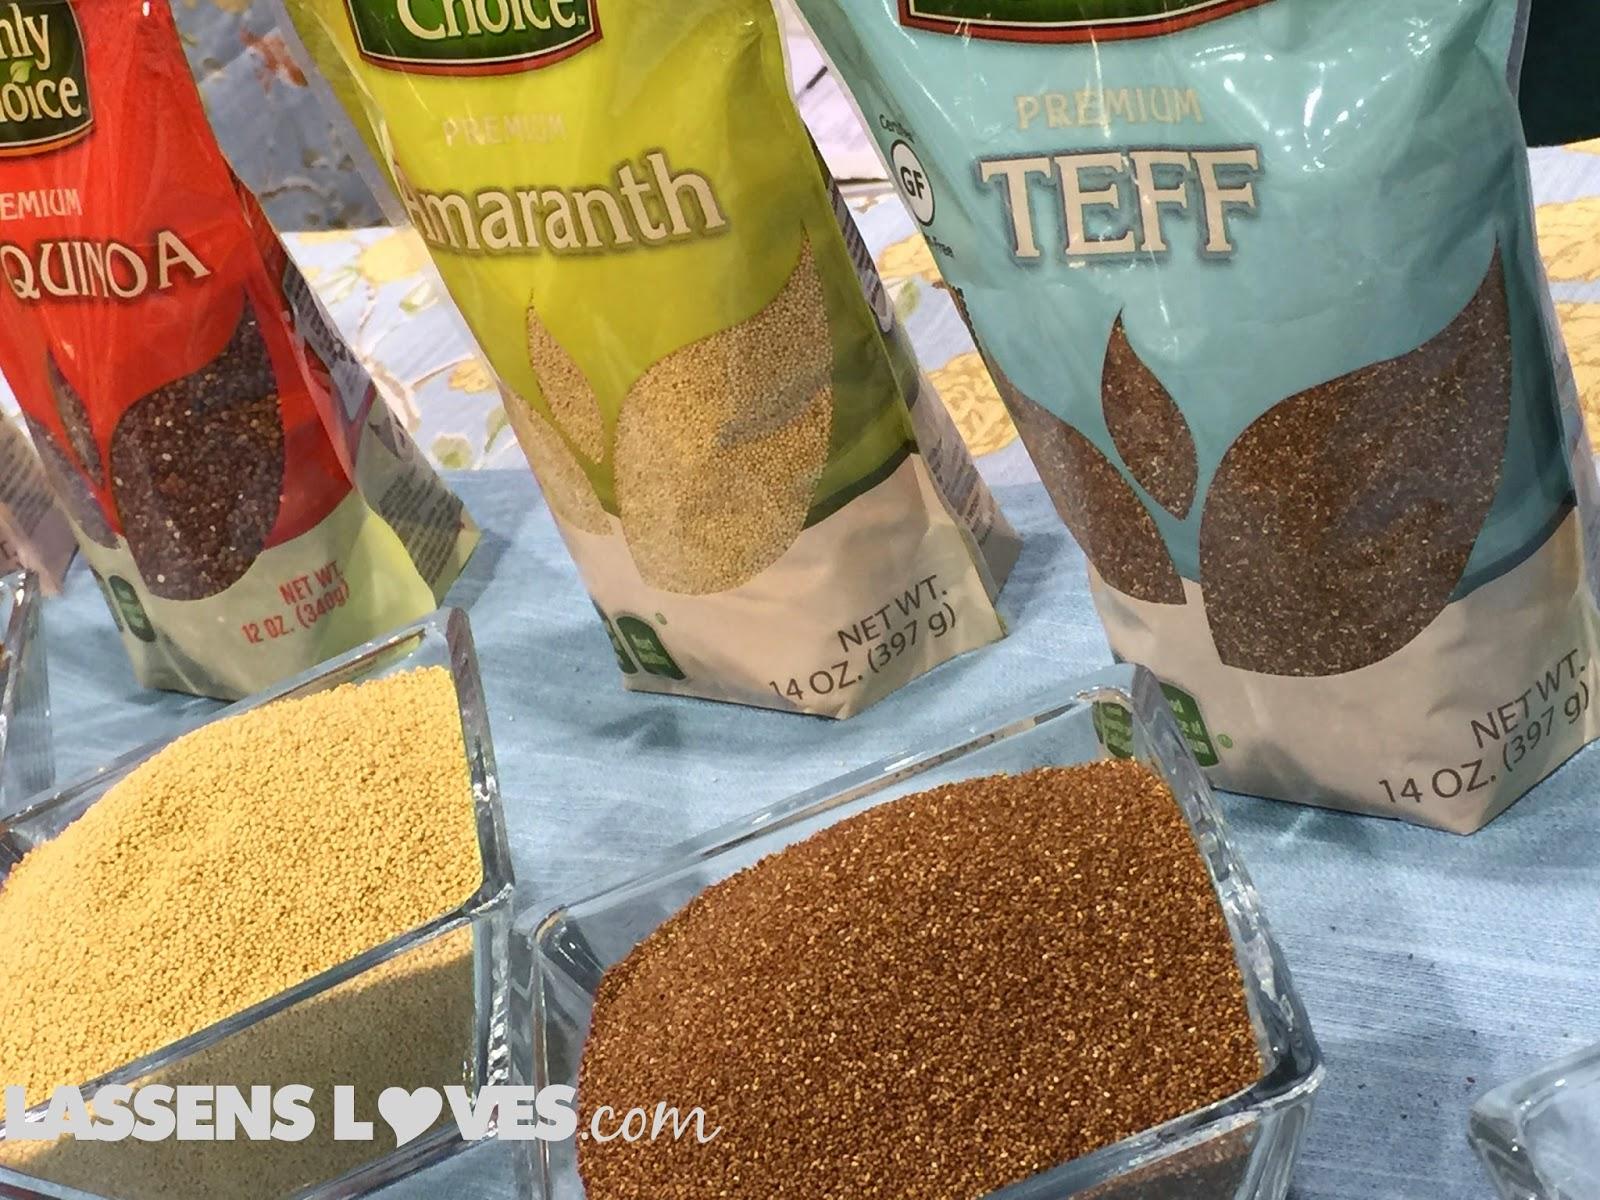 Expo+West+2015, Natural+Foods+Show, New+Natural+Products, quinoa+grains, amaranth+grain, teff+grain